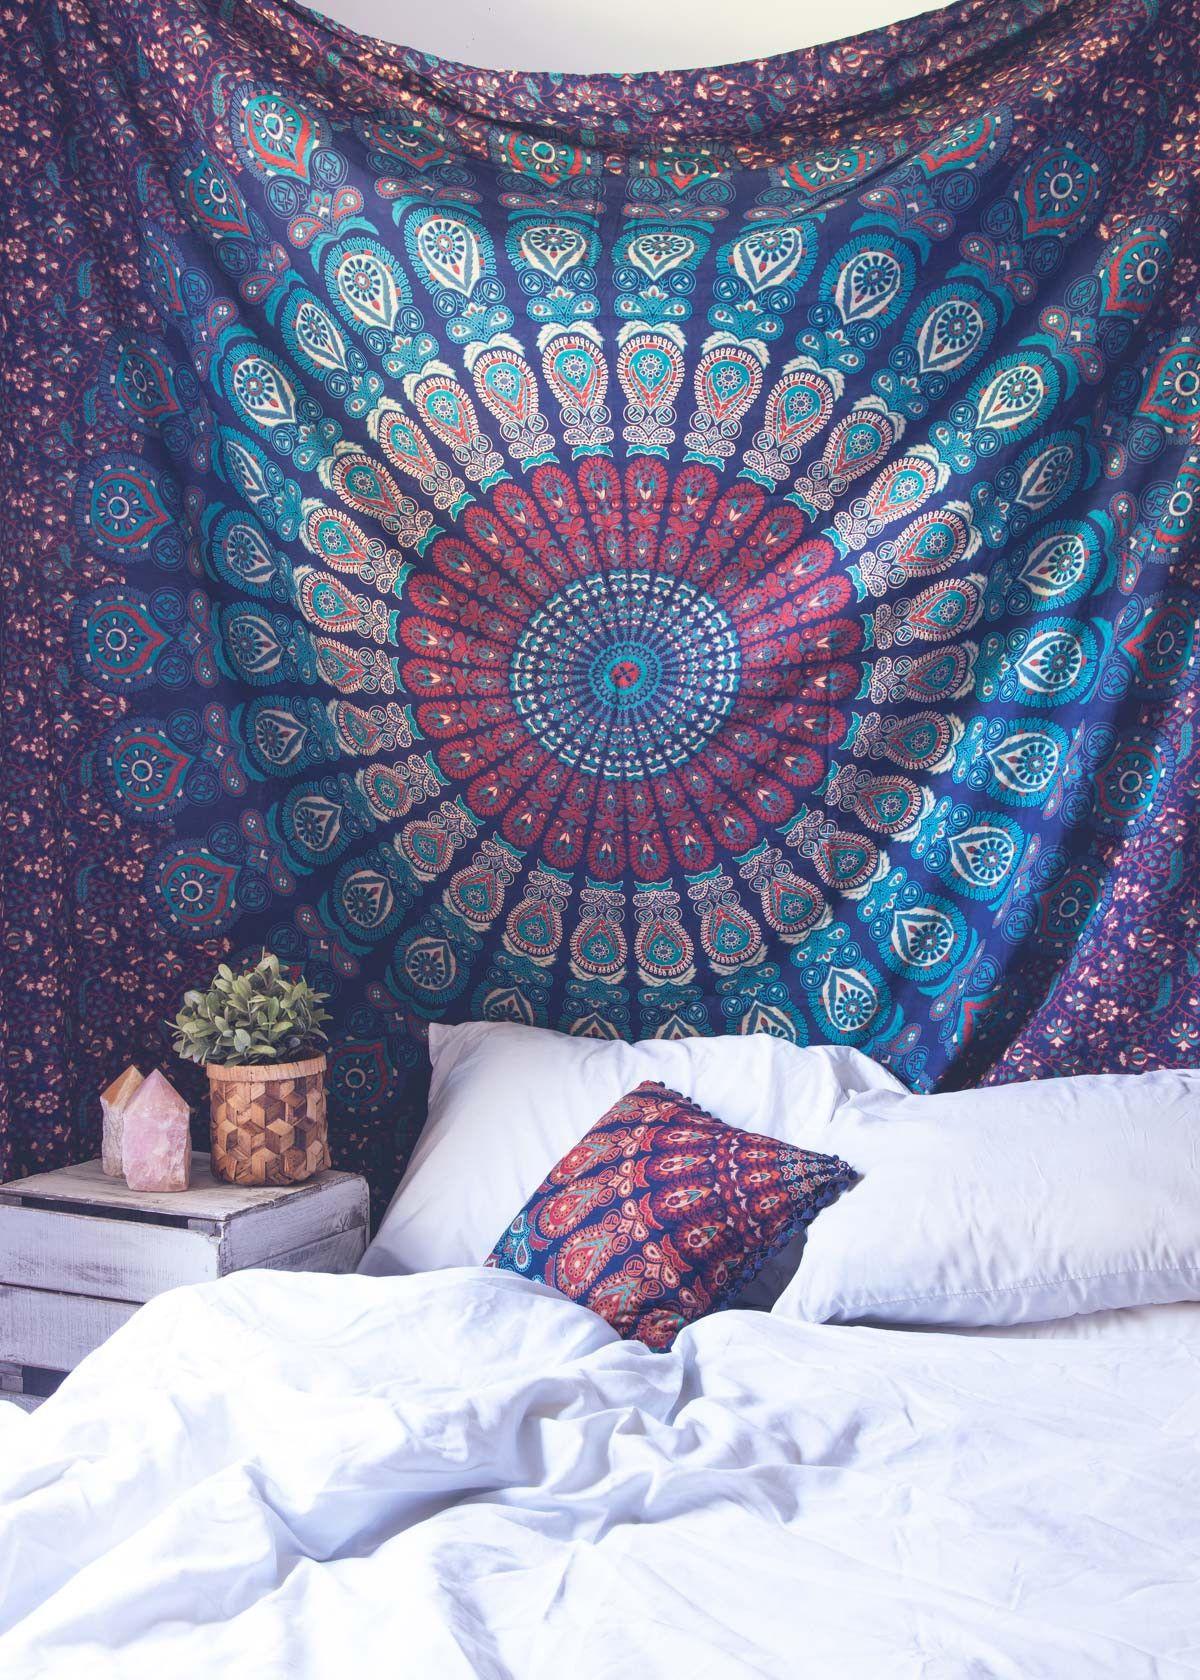 Mahali Medallion Tapestry By SoulMakes Boho Tapestry, Bedroom With Tapestry,  Tapestry Bedding, Rooms